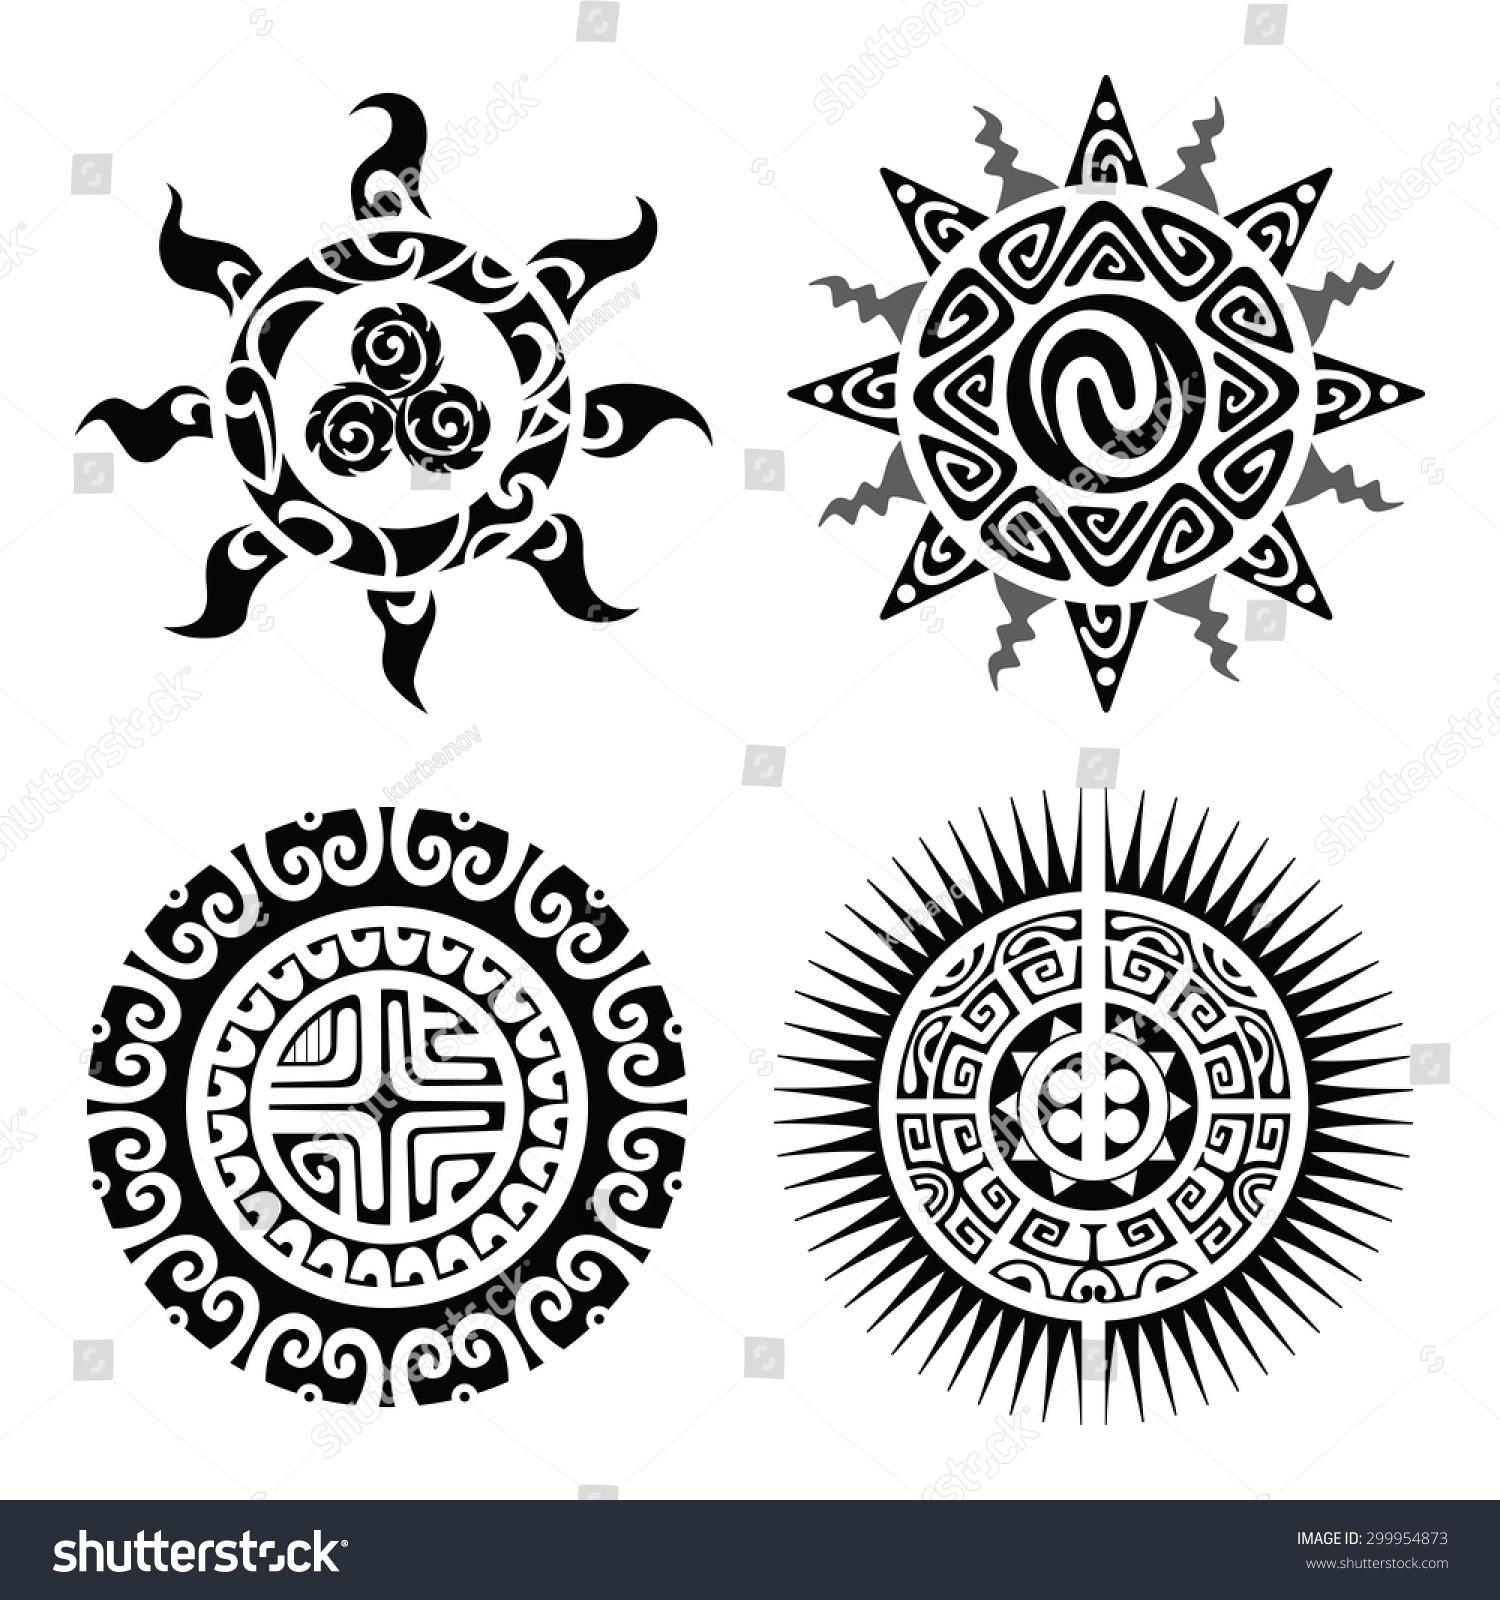 1a5ff5663 Traditional Maori Taniwha tattoo design. Editable vector illustration.